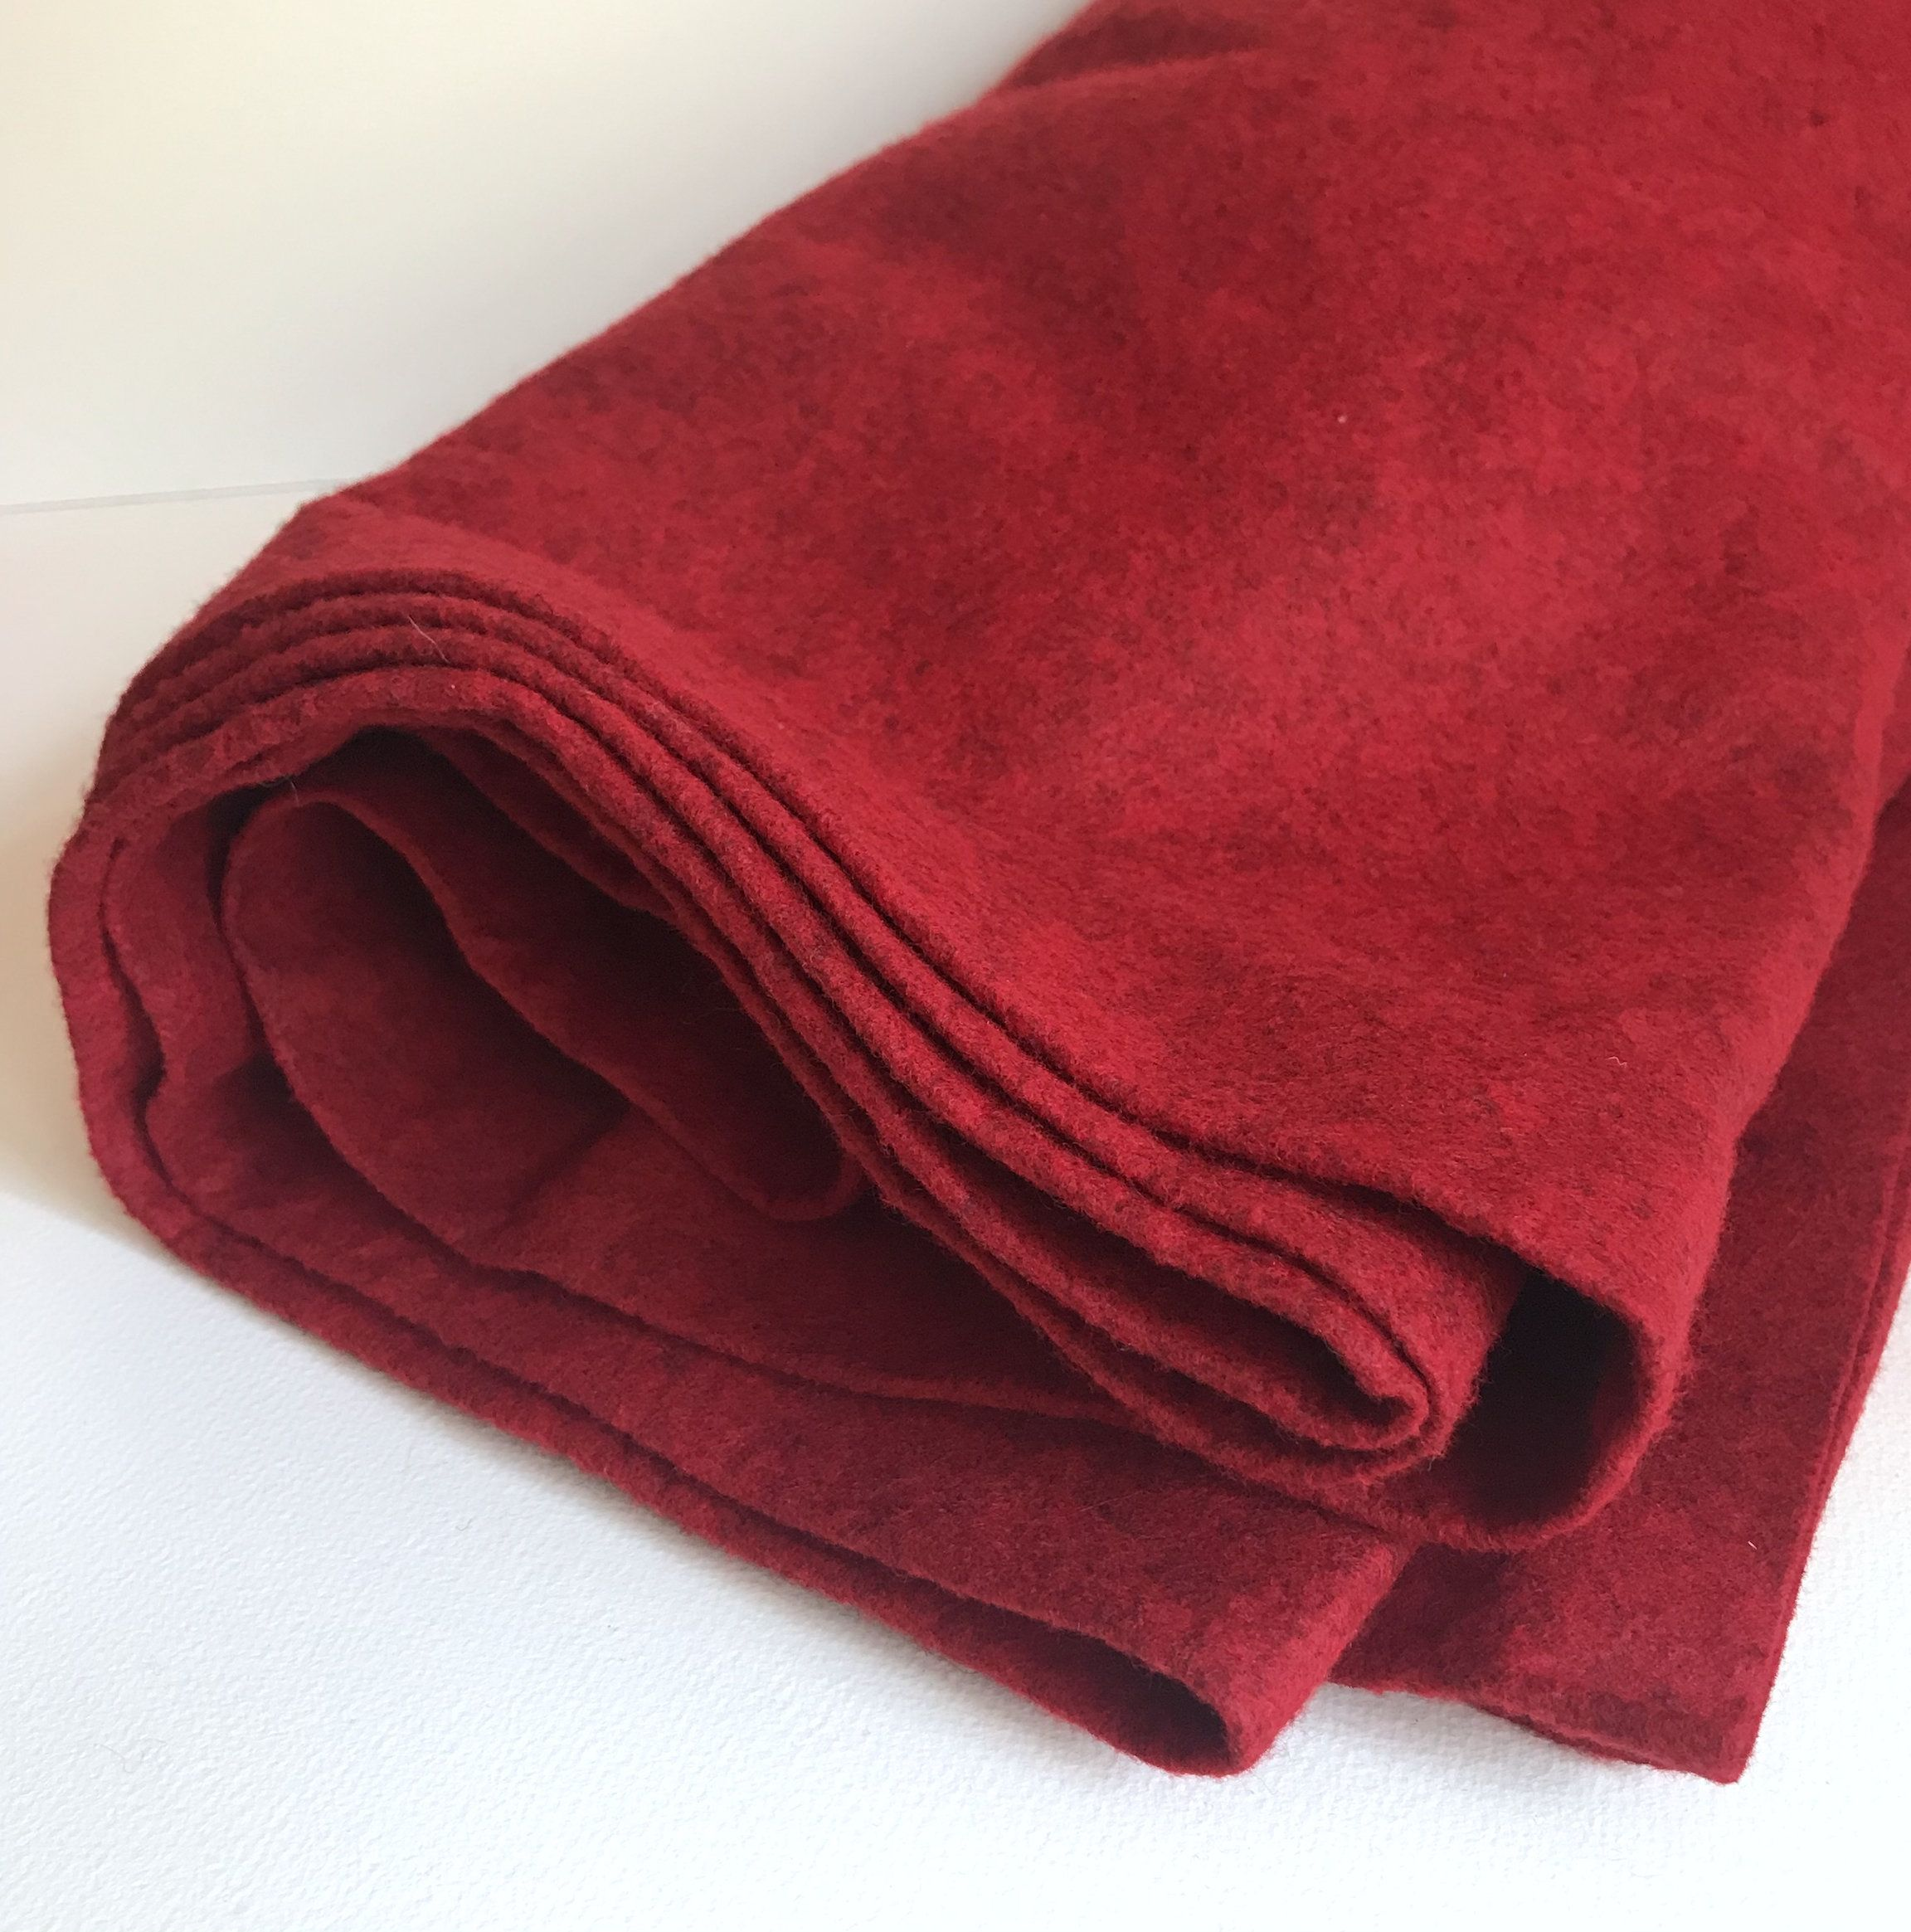 Red 100 Wool Felt Fabric By The Yard Rusty Red Wool 1 Yard X 37 Wide Vintage Heathered Wool Fabric Piece 1946 In 2020 Wool Felt Fabric Felt Fabric Wool Felt